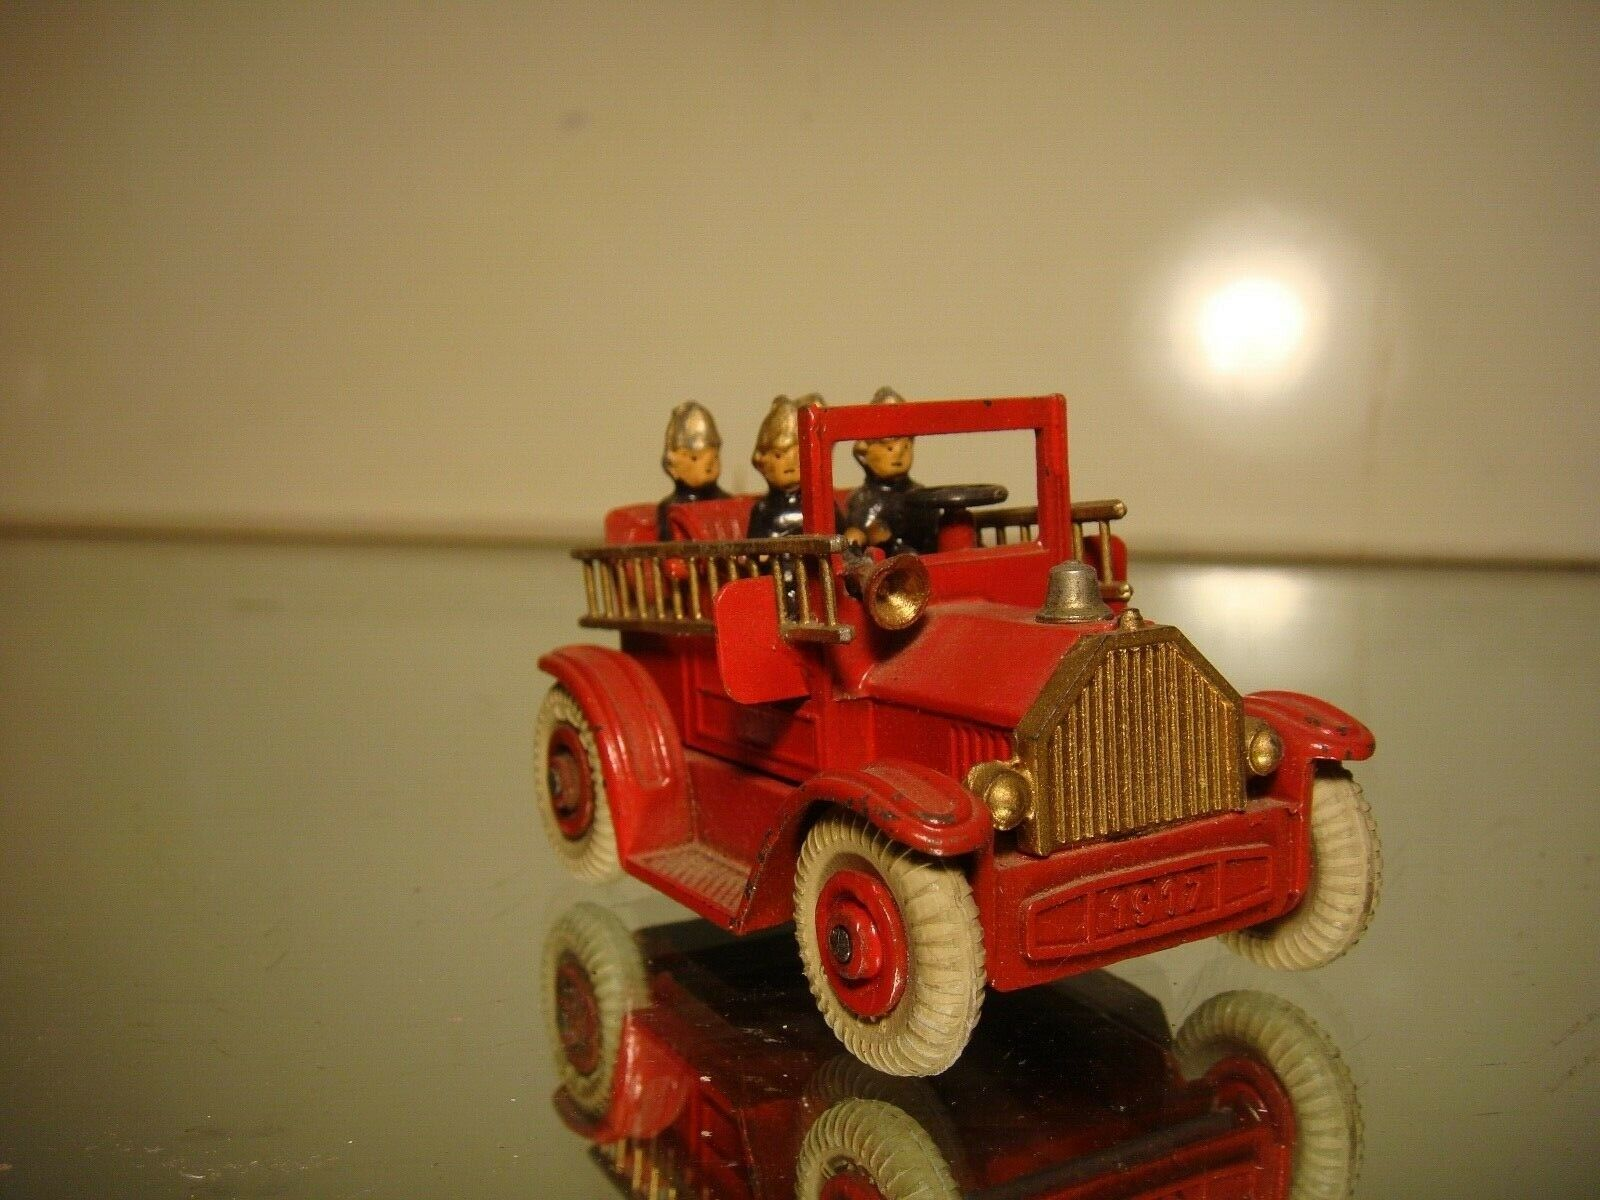 KL-D camion dei pompieri, molto molto raro